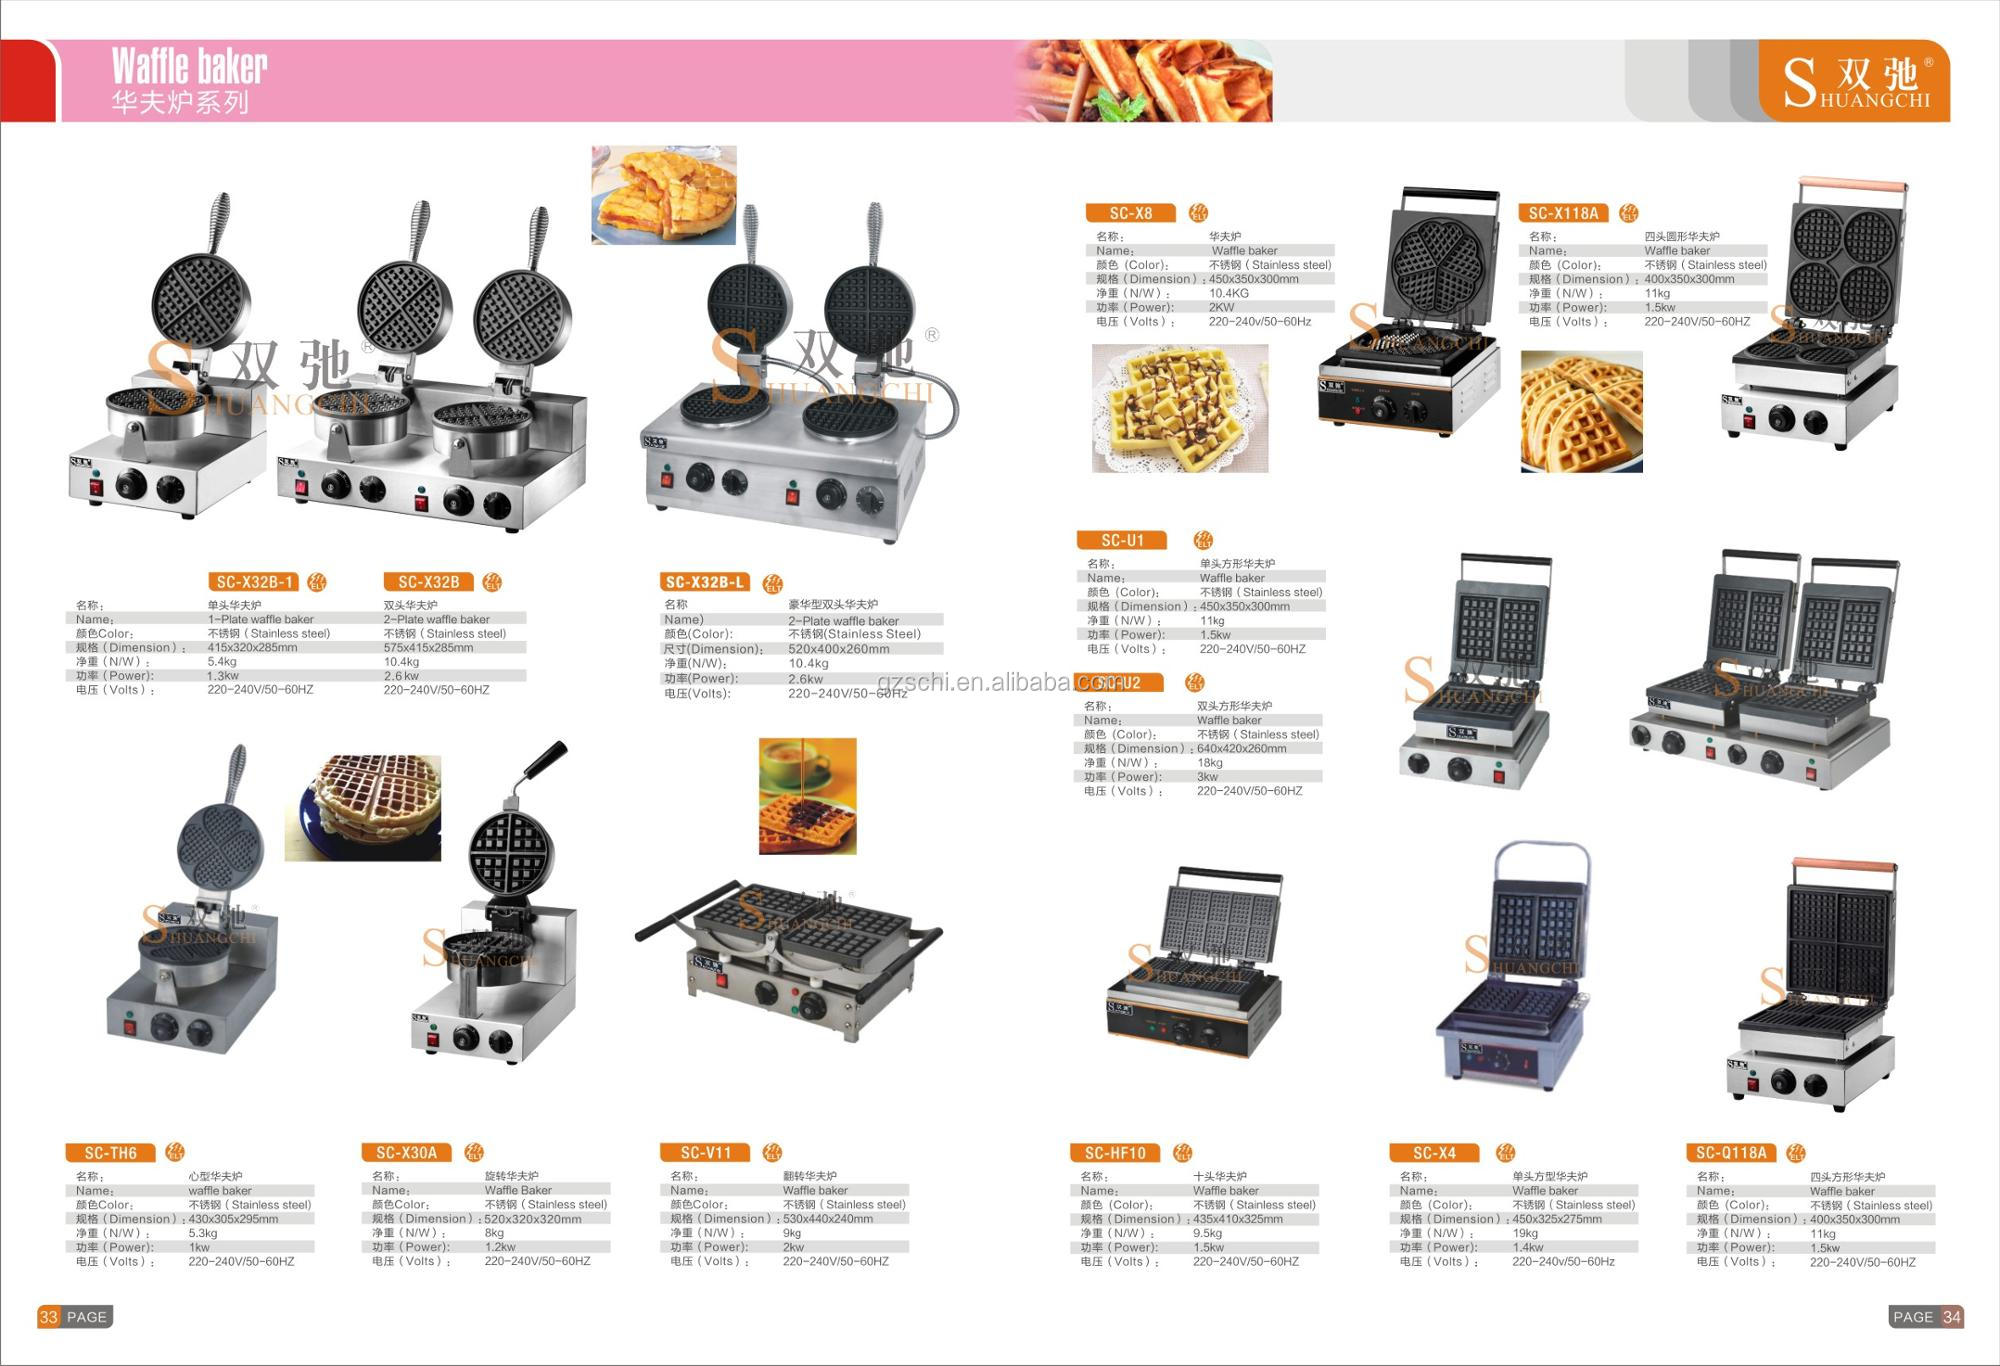 SC-HD8 Hot Selling High Quality Square Waffle Maker Muffin Machine waffle  cone baker, View Muffin Machine, Shuangchi Product Details from Guangzhou